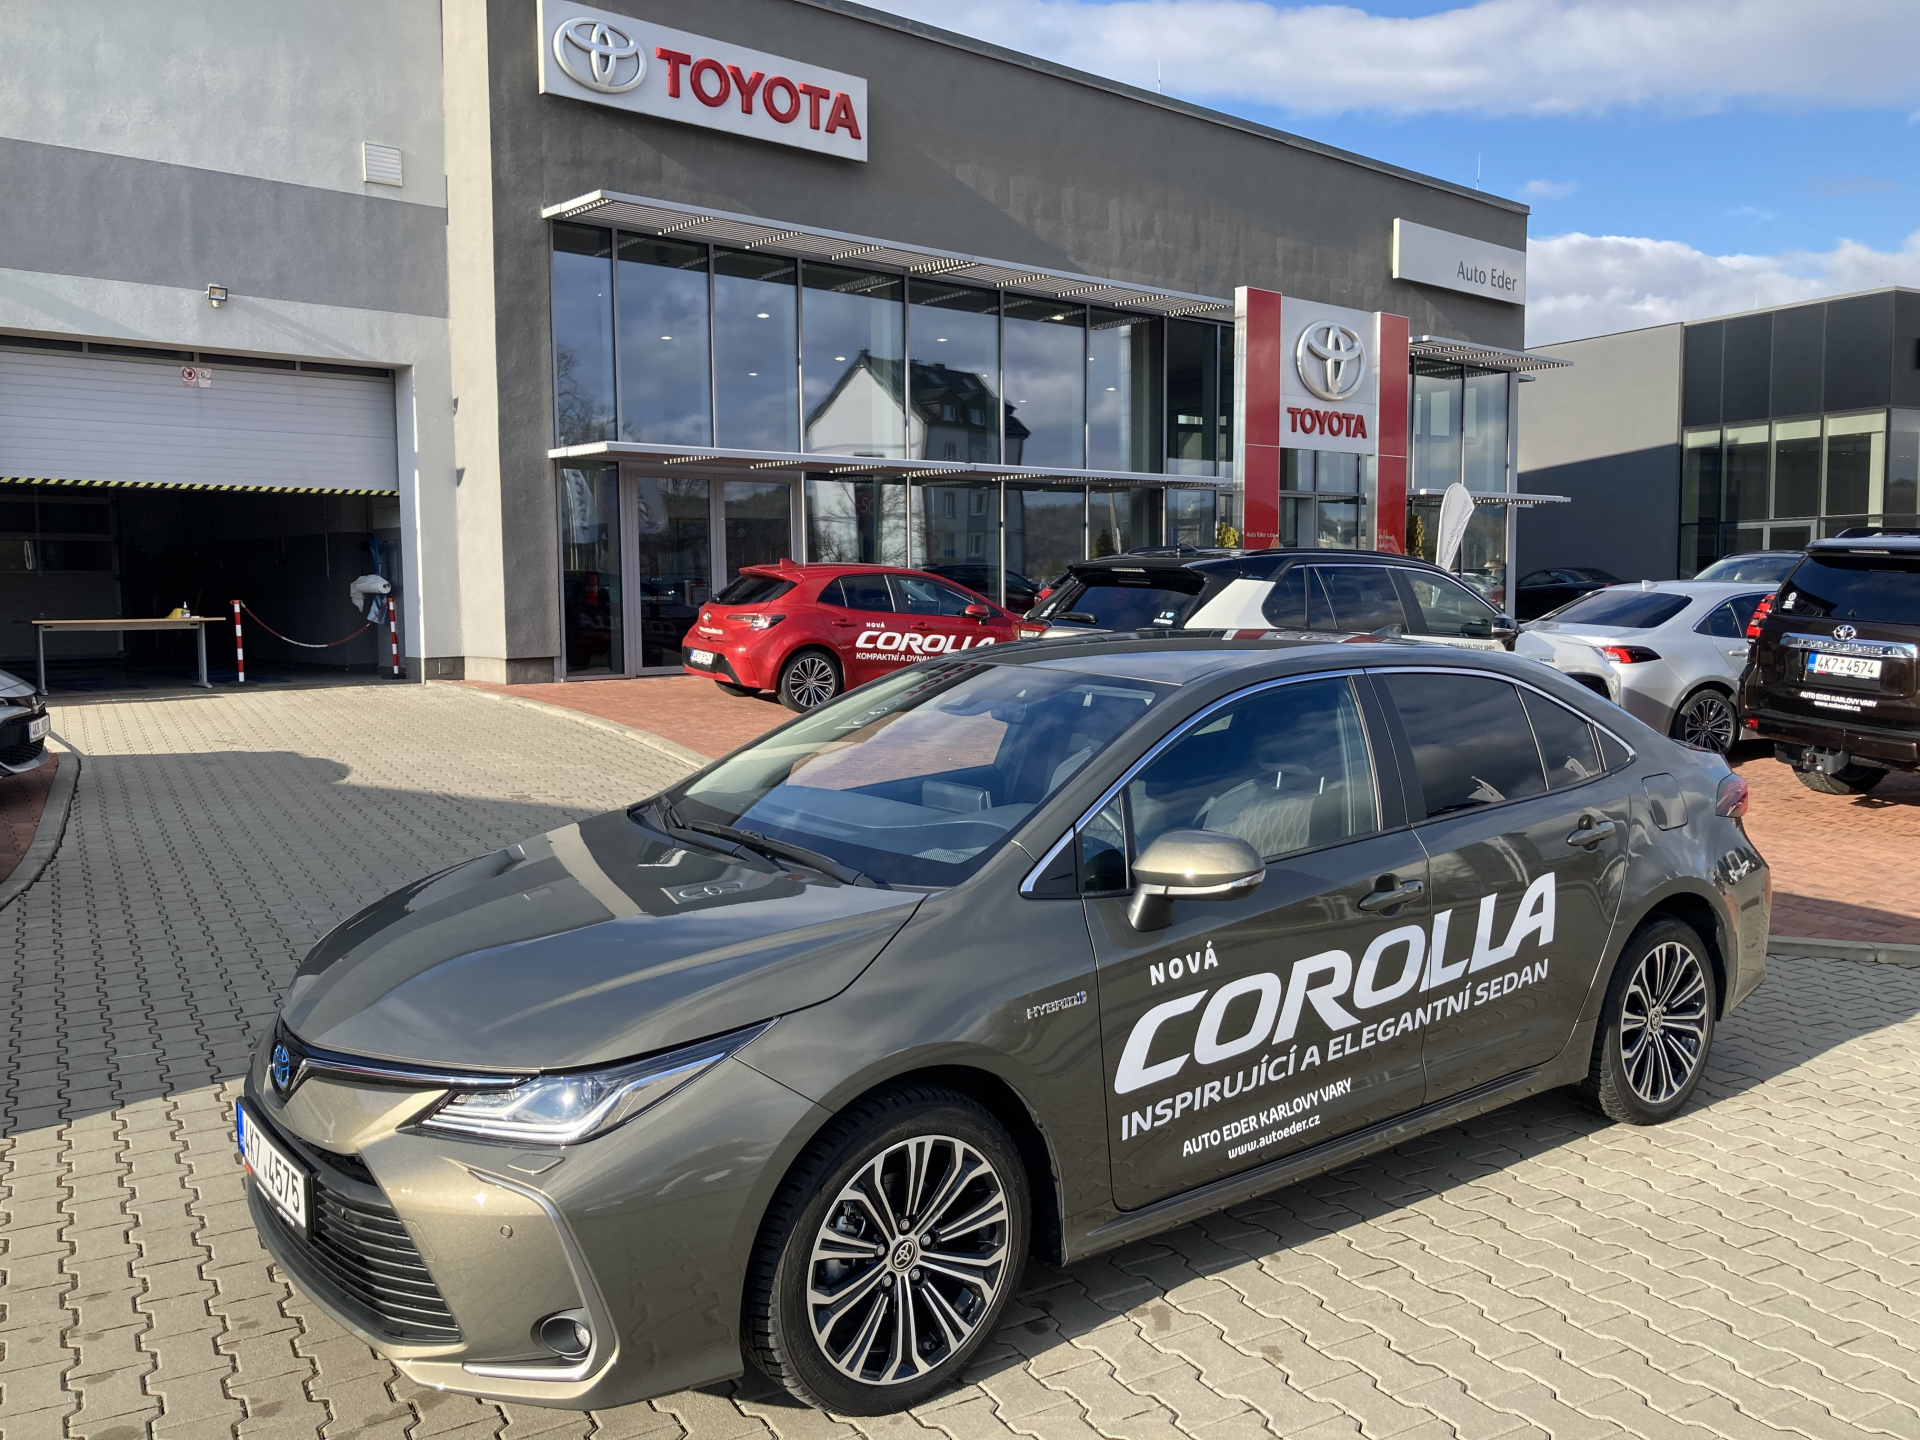 Toyota COROLLA Sedan 1,8 Hybrid (122 k) aut. e-CVT Comfort